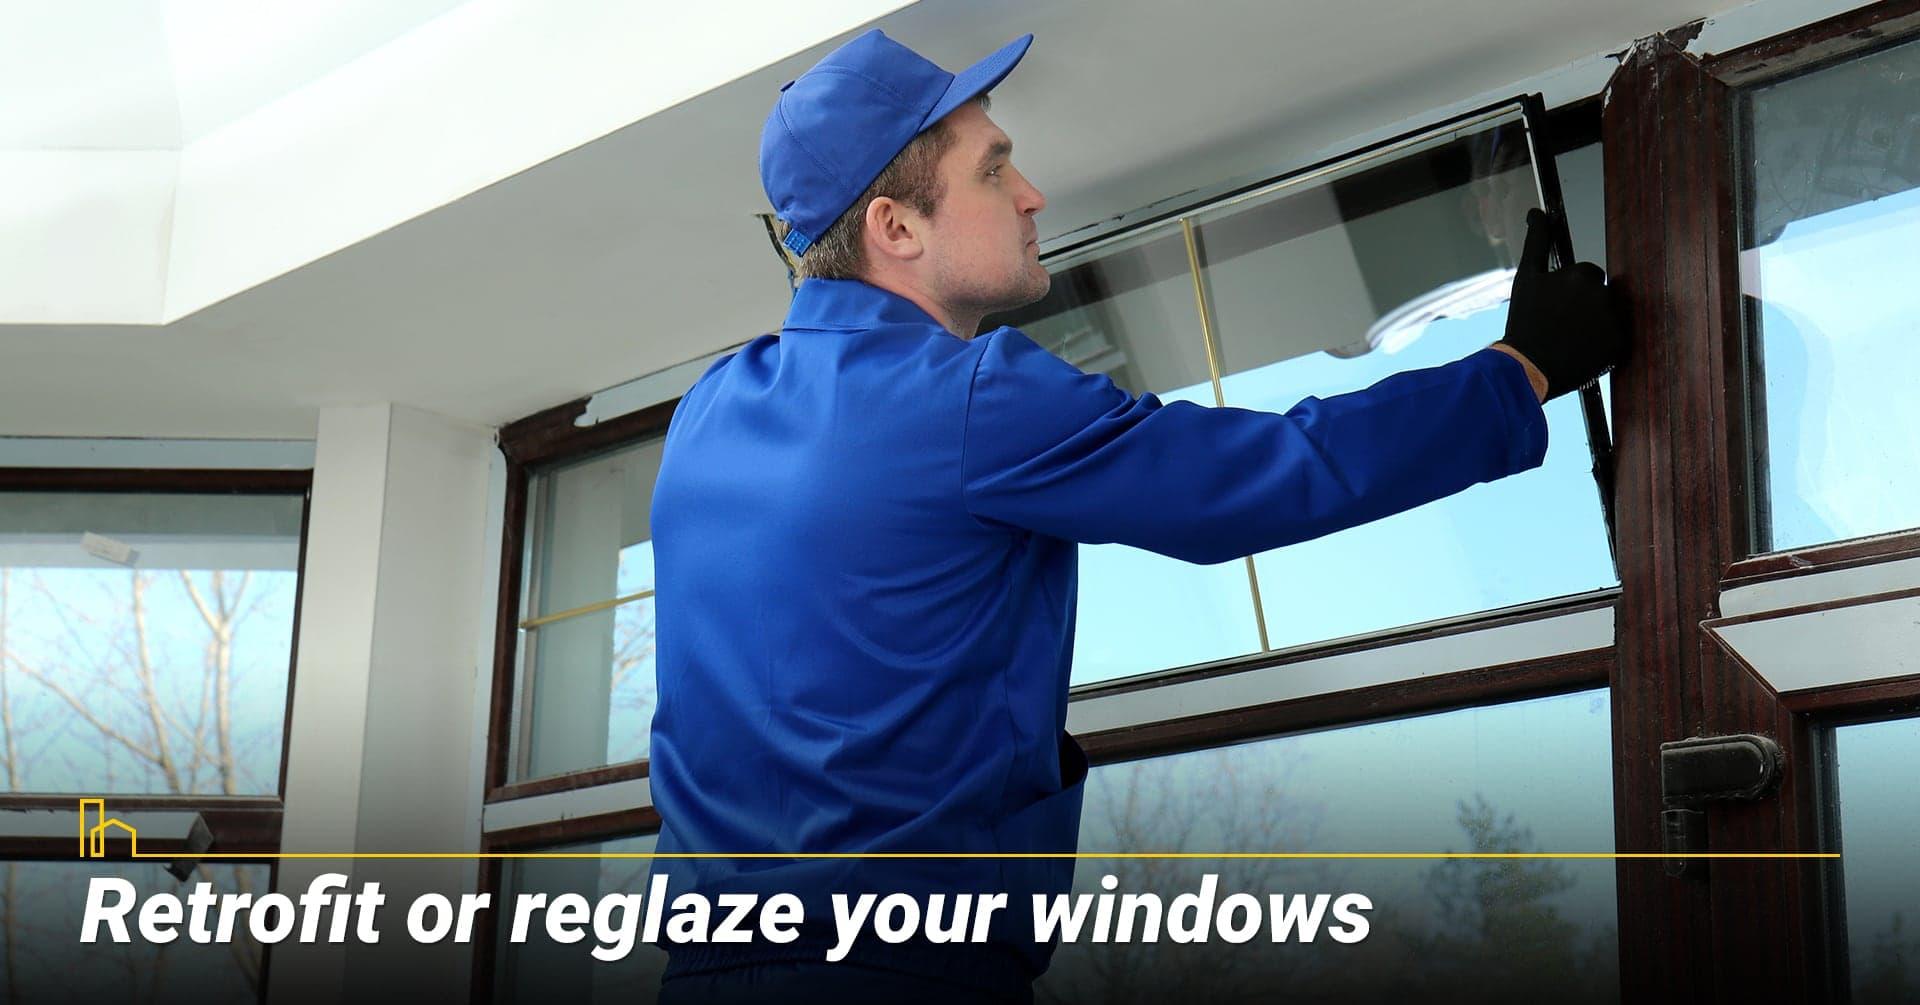 Retrofit or reglaze your windows, recondition old windows